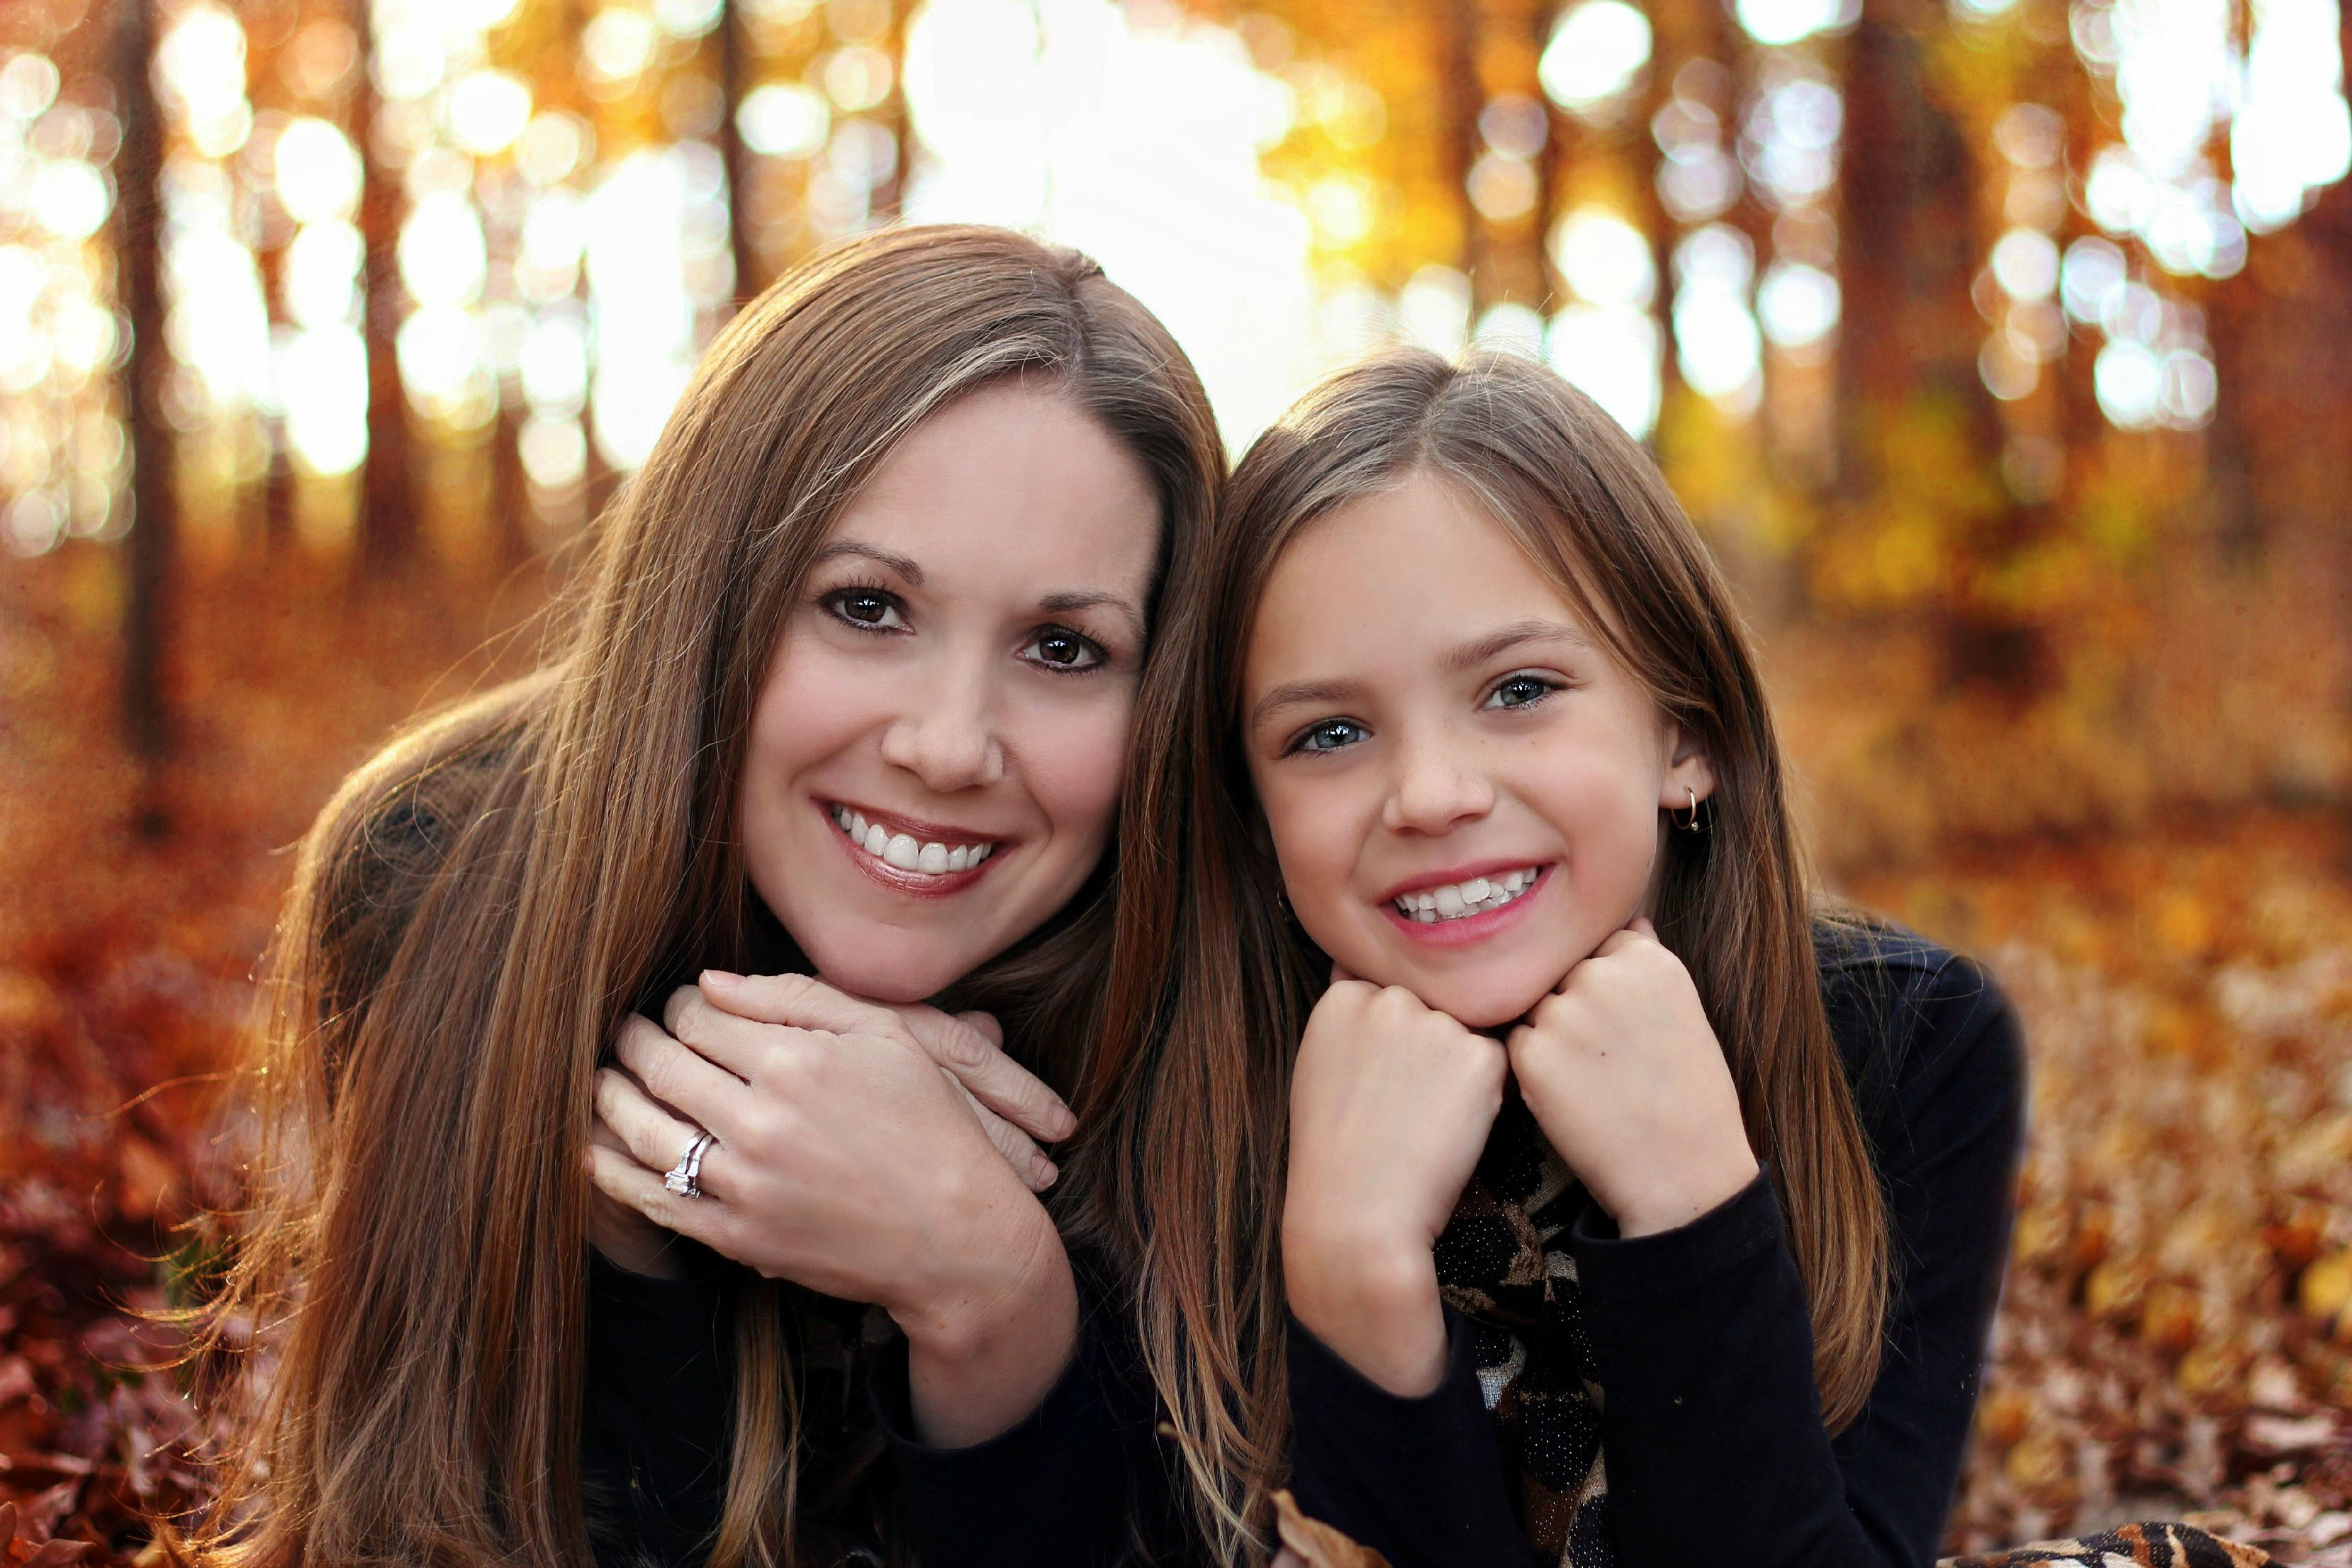 midvale single parents ★ midvale entertainment center by loon peak @ best shopping online entertainment centers on sale 2017 ★ online deals shop for prices on sale,.